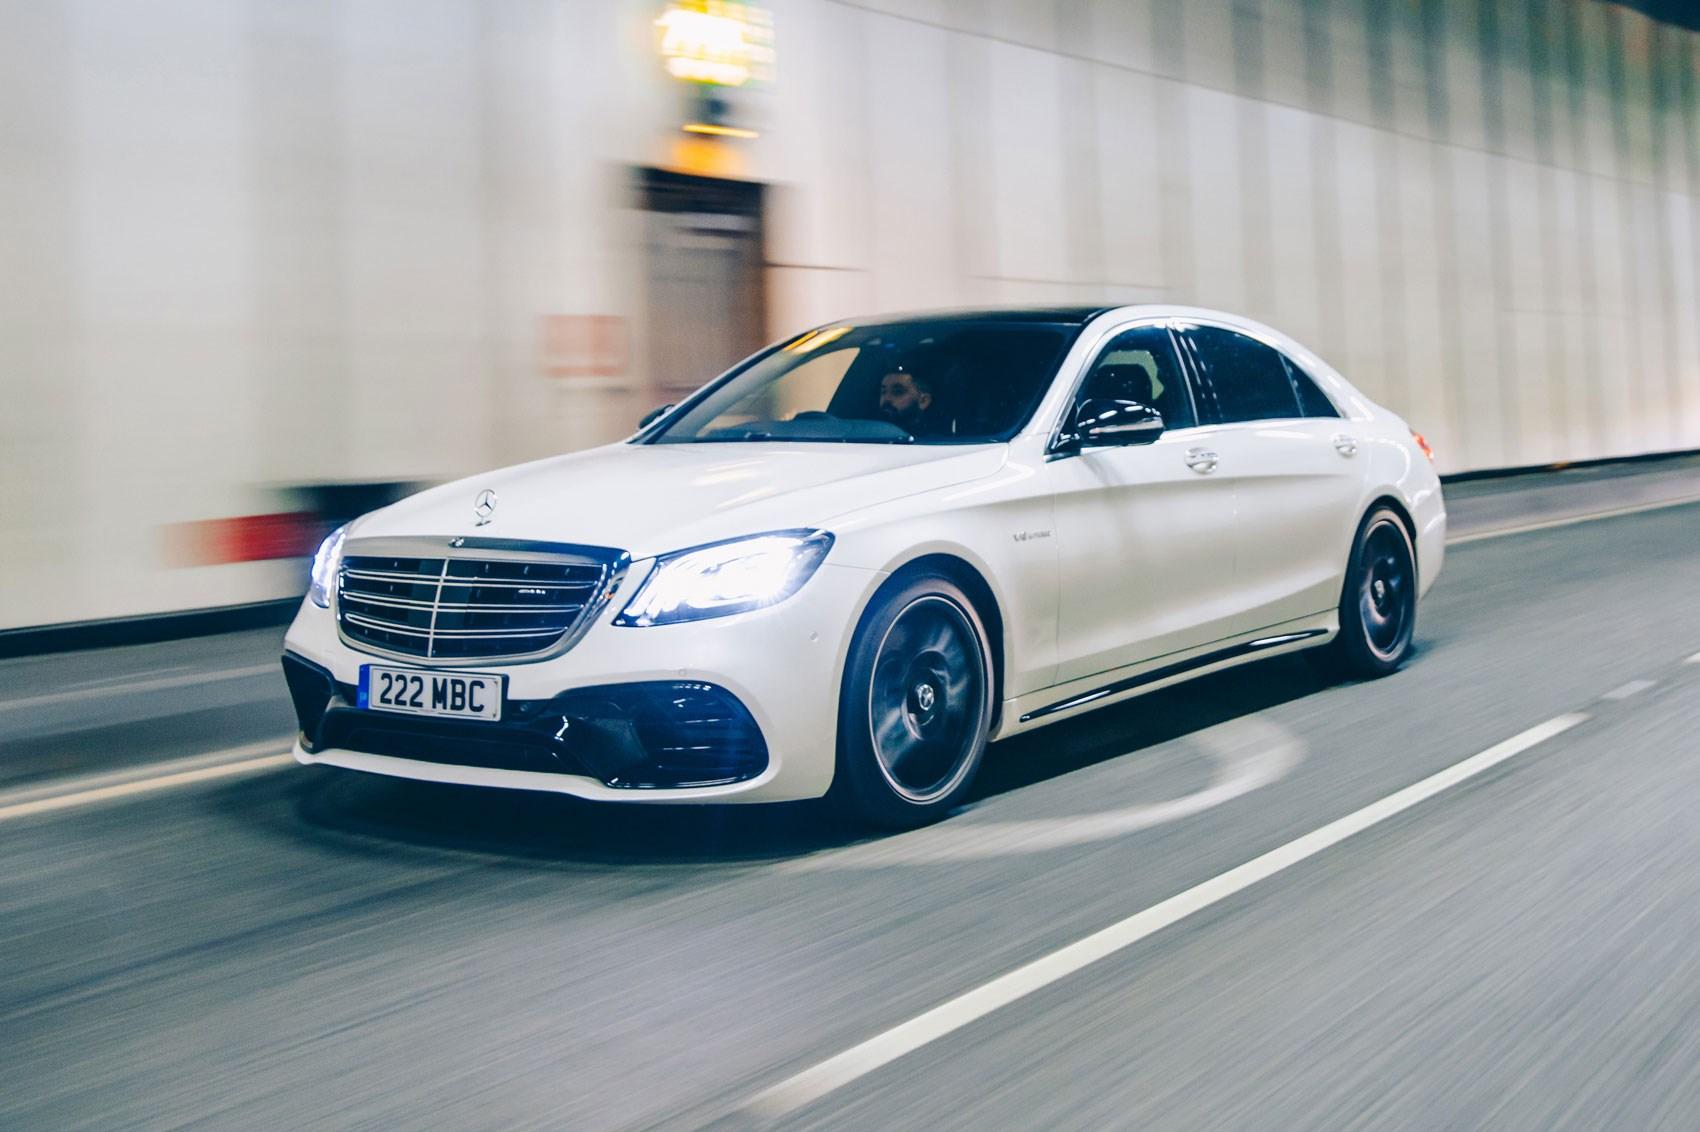 Mercedes Benz S-63